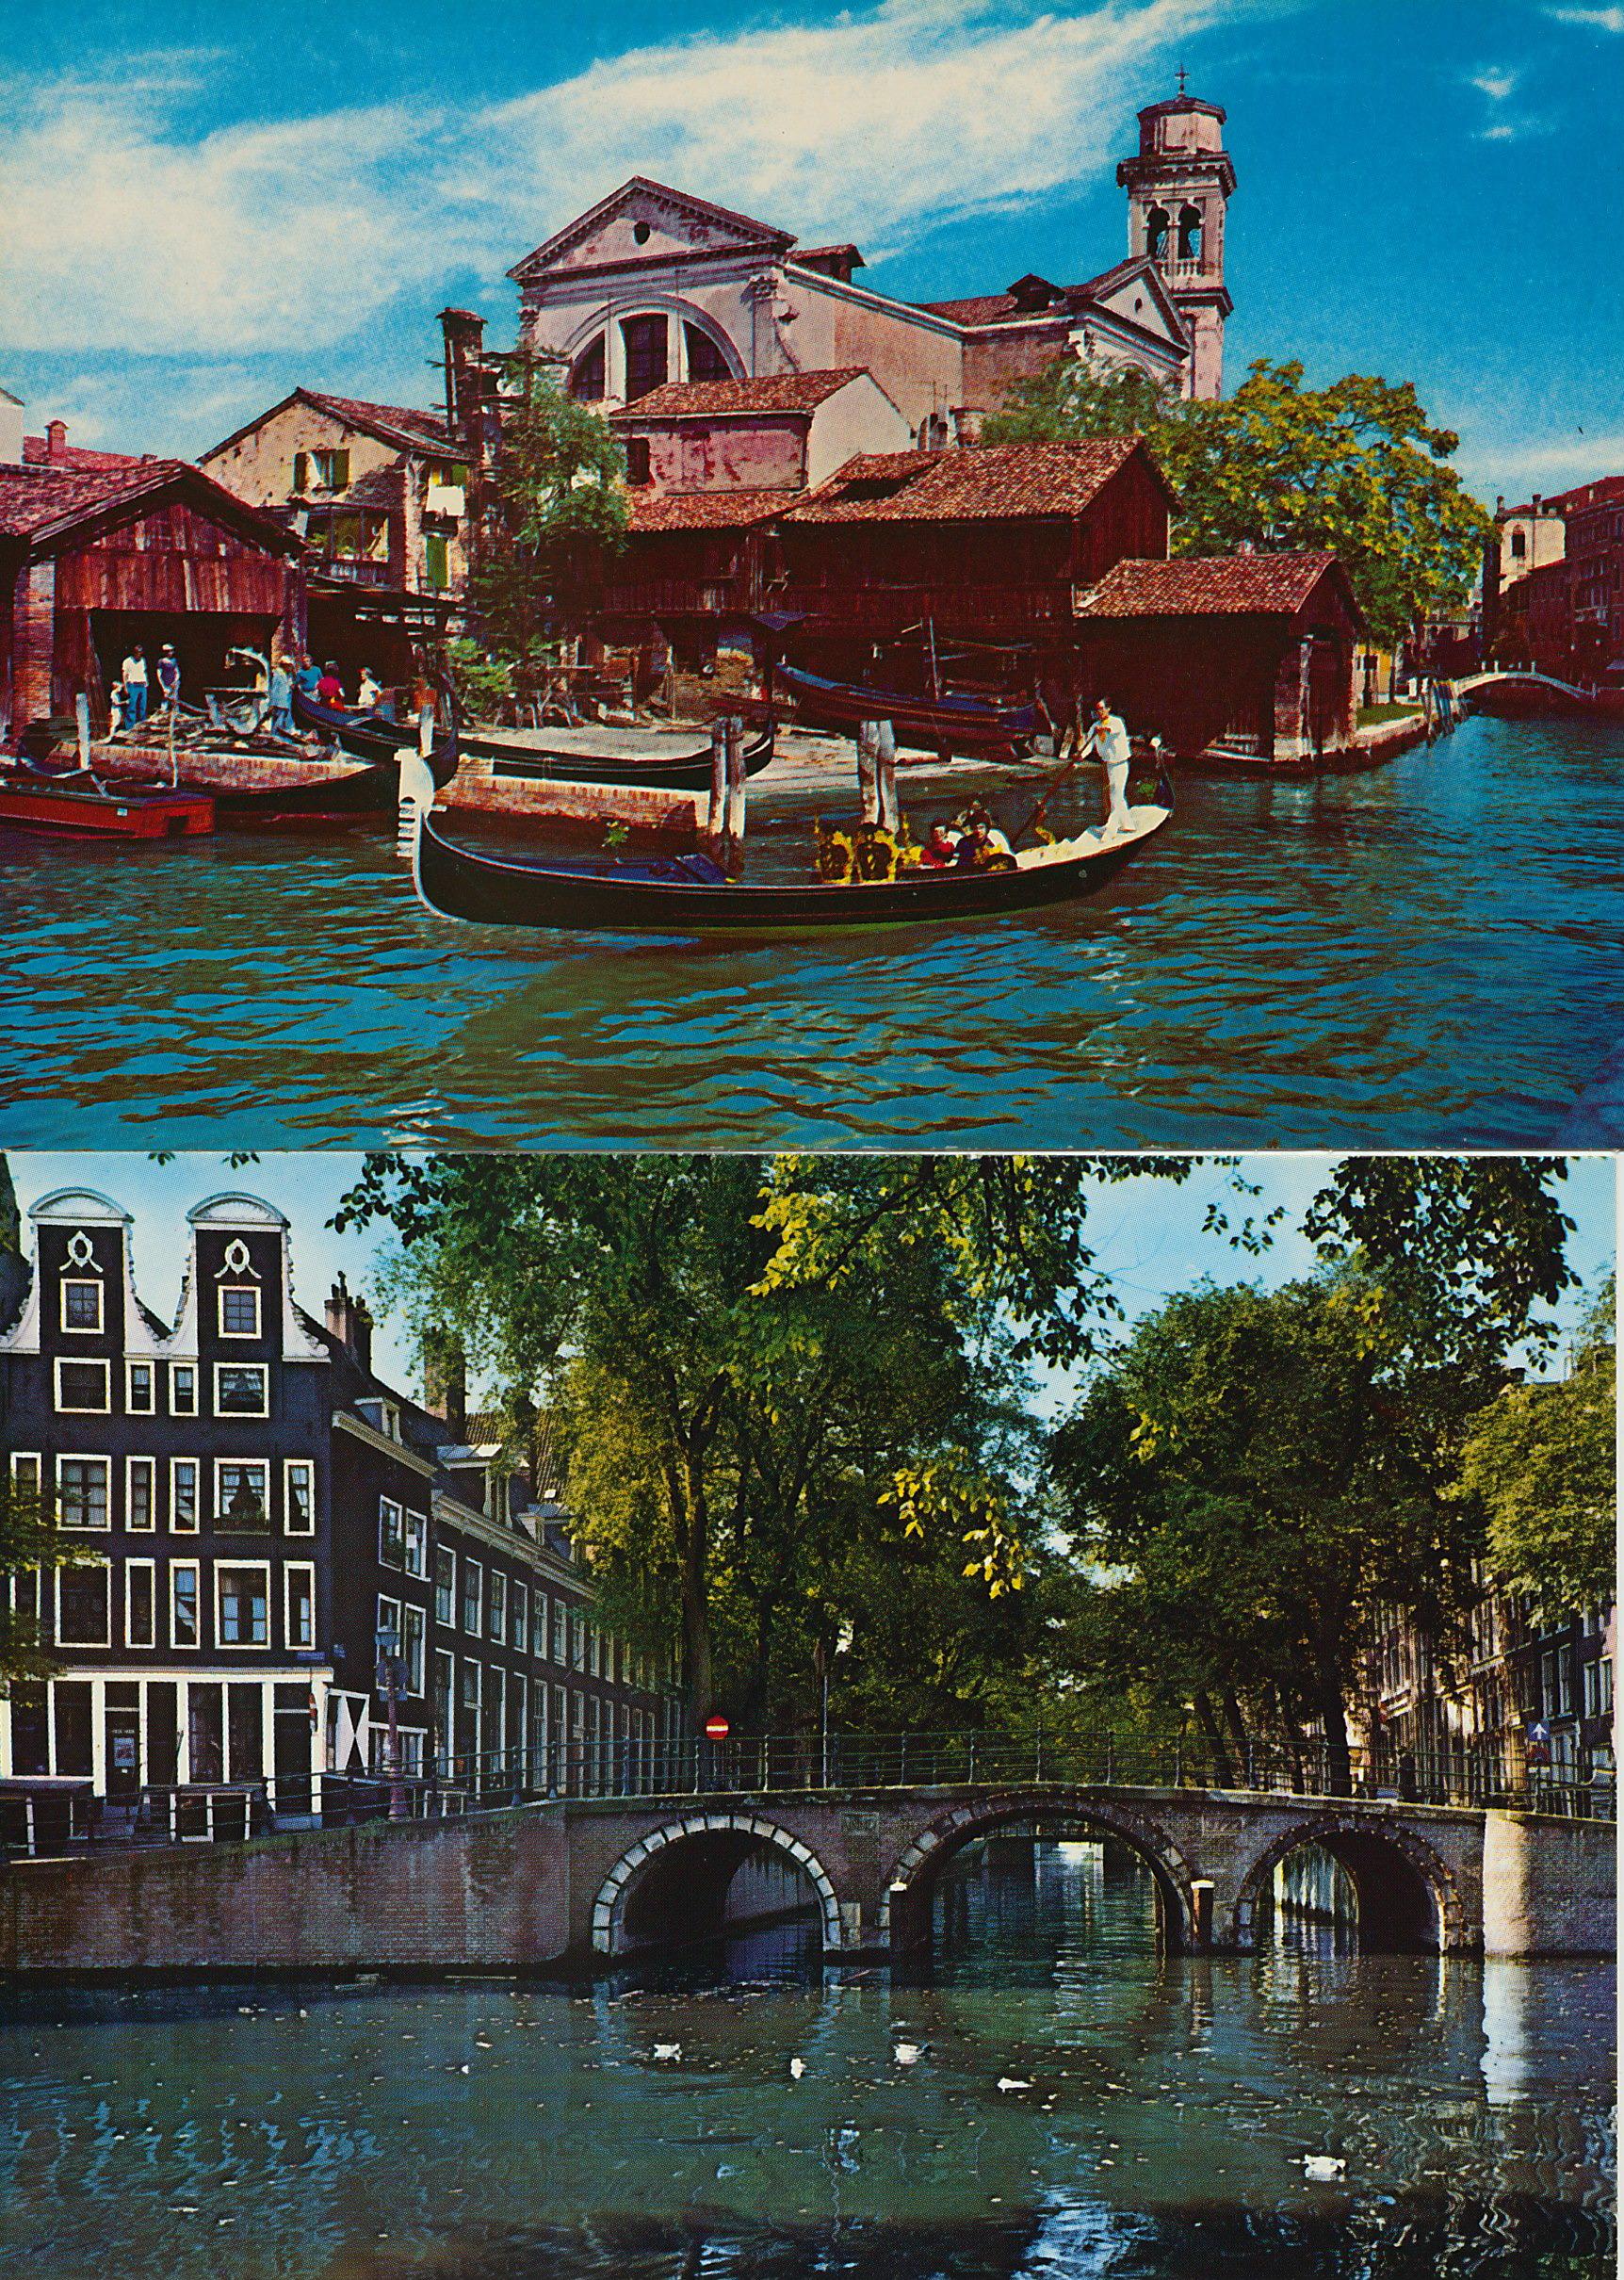 VeniceandAmsterdam